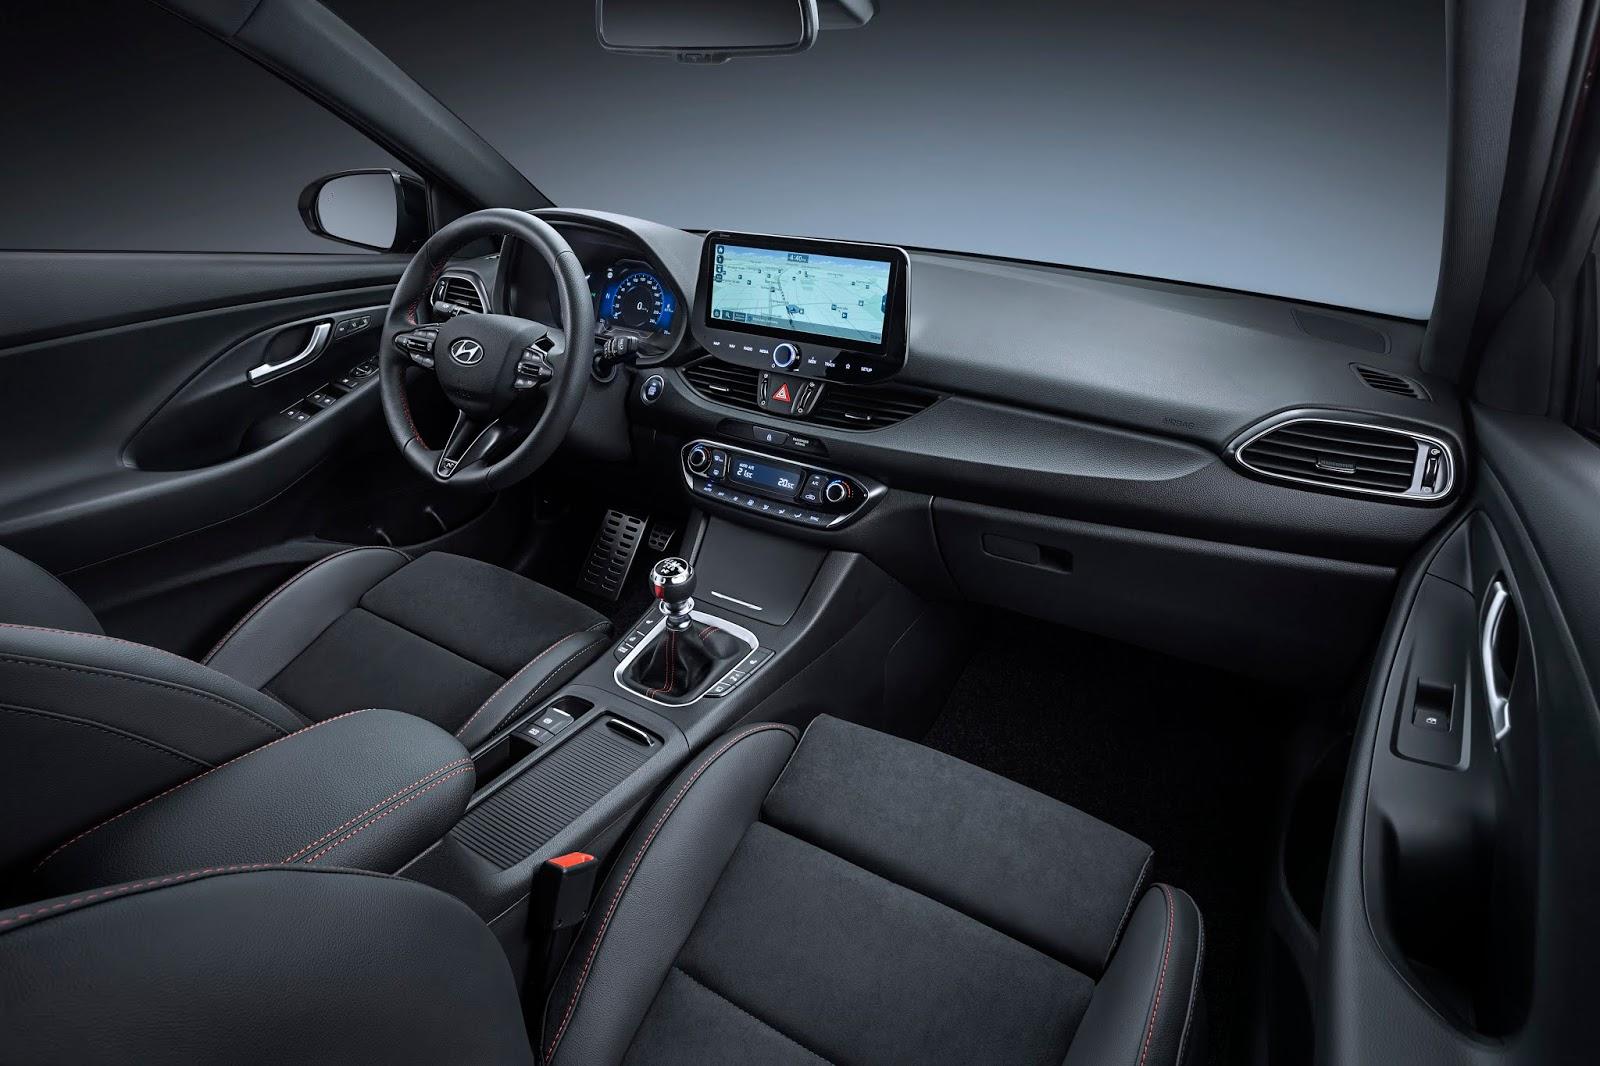 hyundai i30 N Line interior 0220 01 Για πρώτη φορά σε έκδοση N Line το Hyundai i30 Hyundai, Hyundai i30, ειδήσεις, καινούργιο, καινούρια, καινούριο